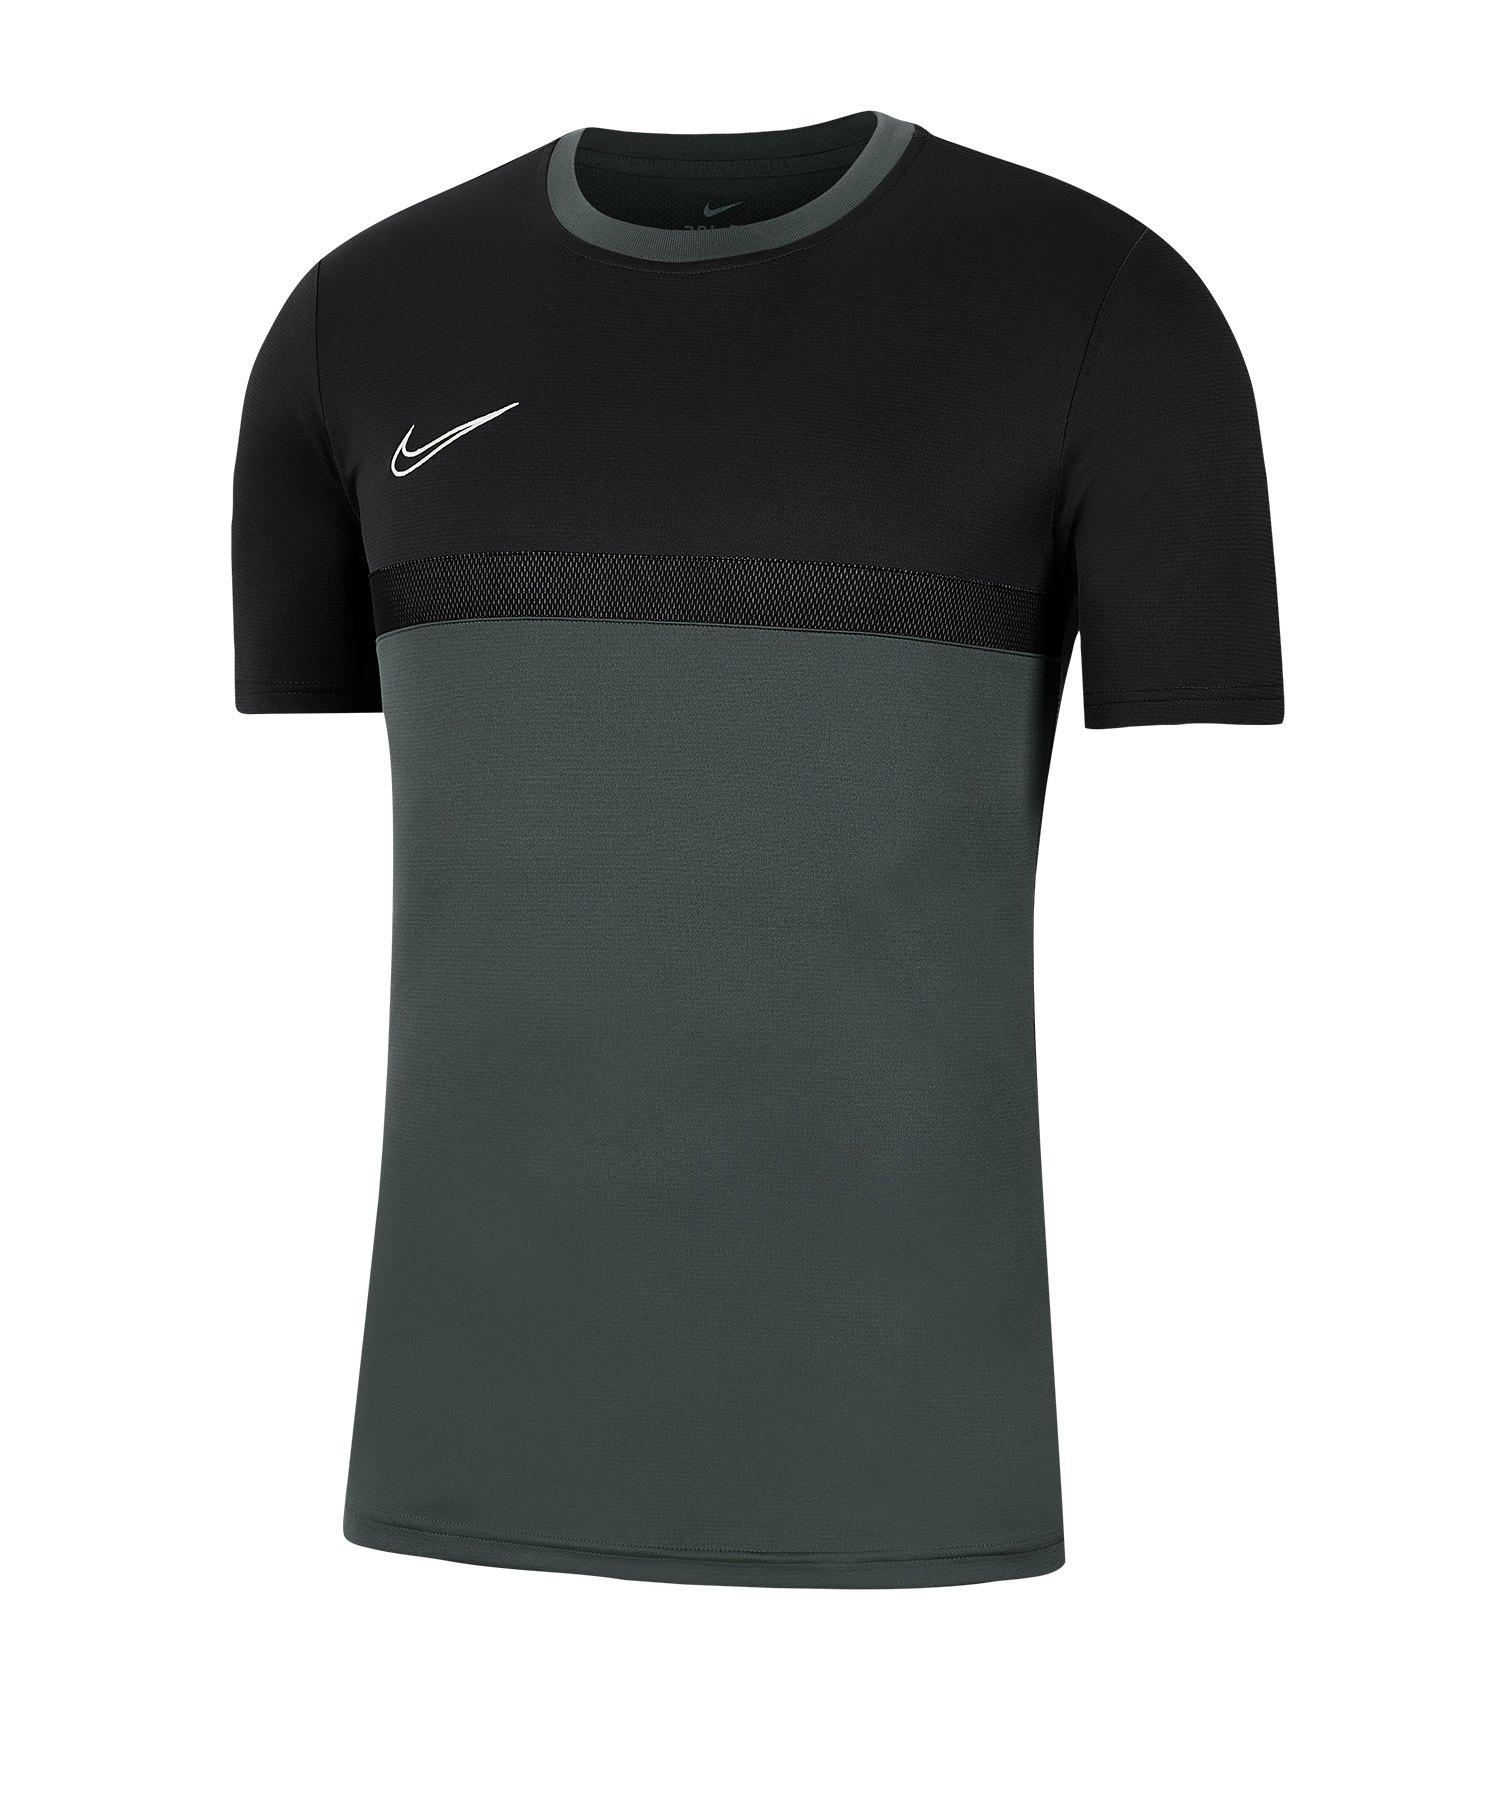 Nike Academy Pro Shirt kurzarm Kids F069 - grau